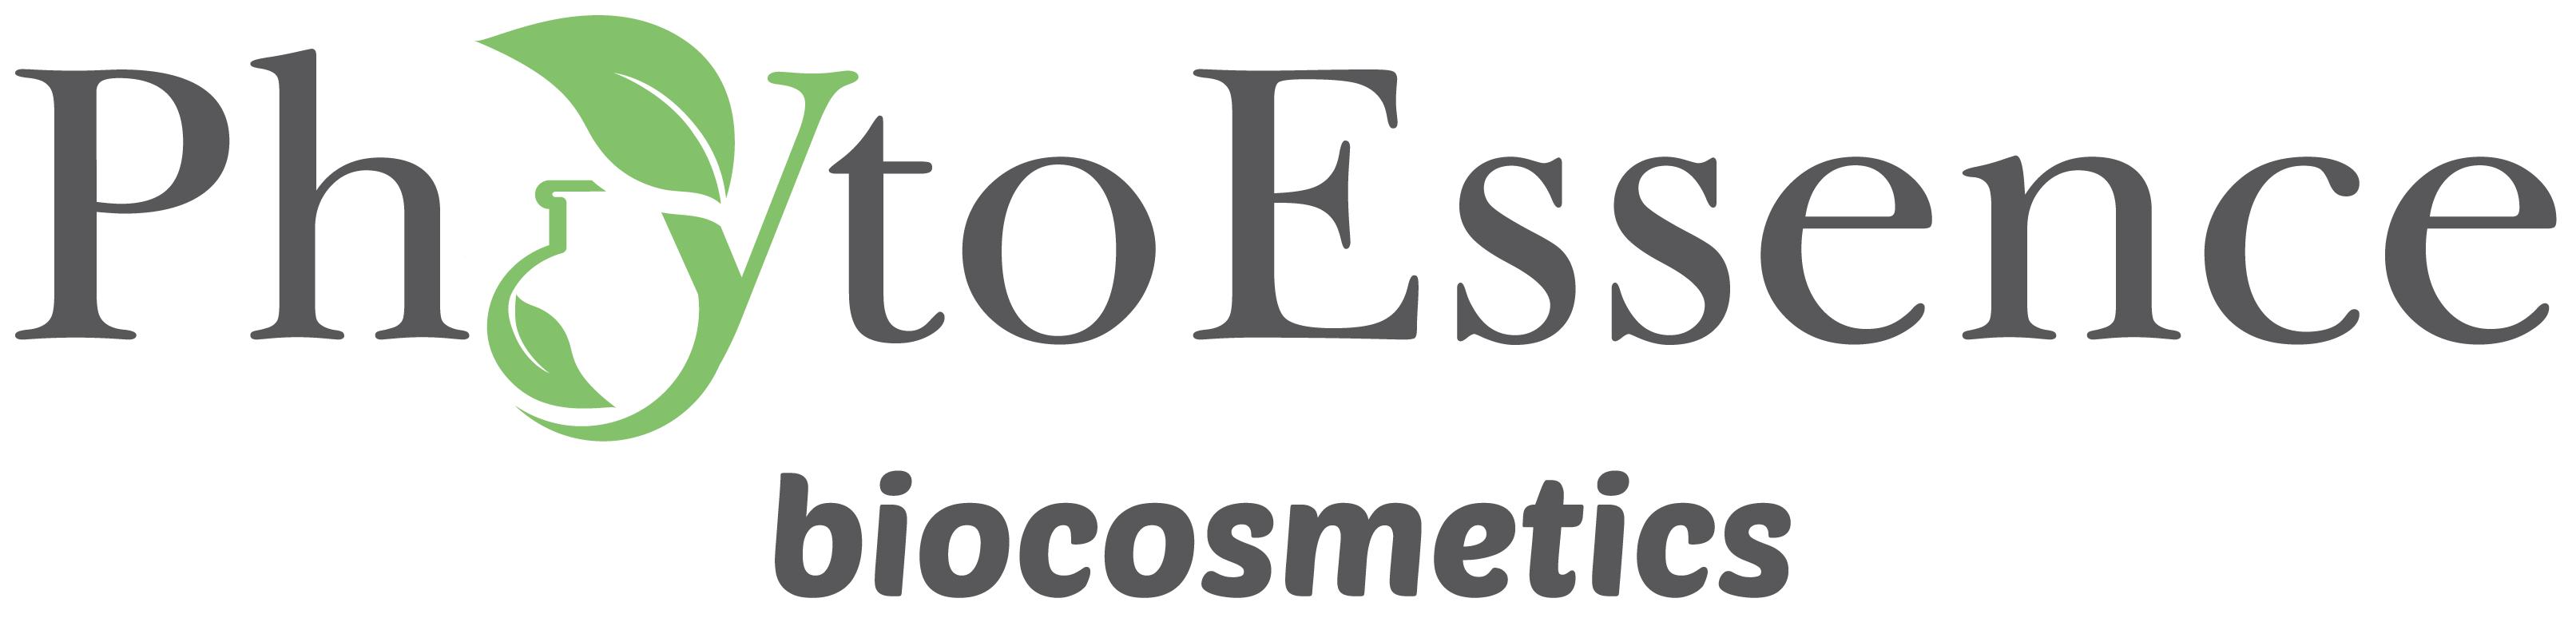 PhytoEssence Biocosmetics *